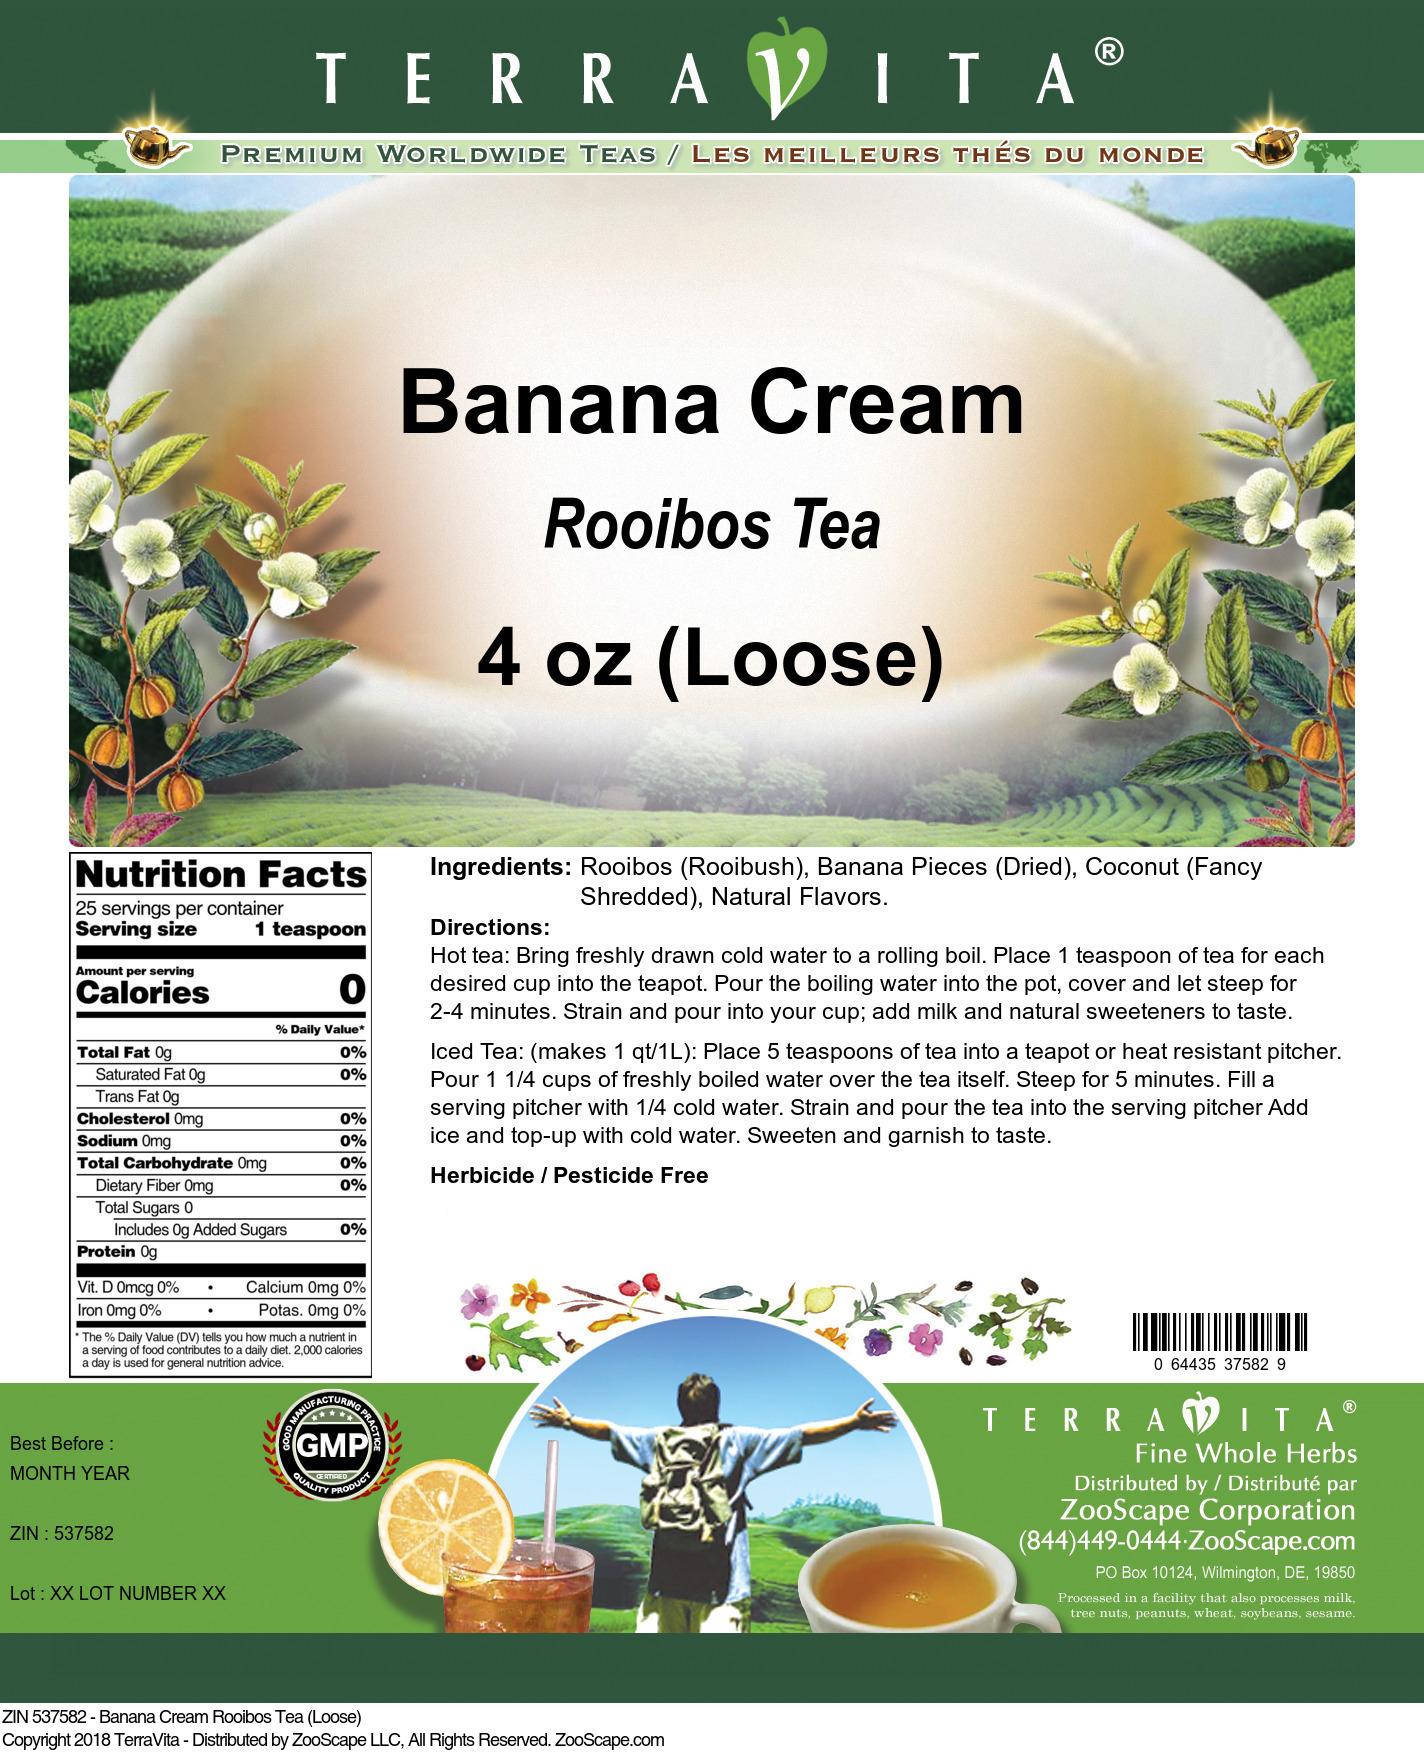 Banana Cream Rooibos Tea (Loose)